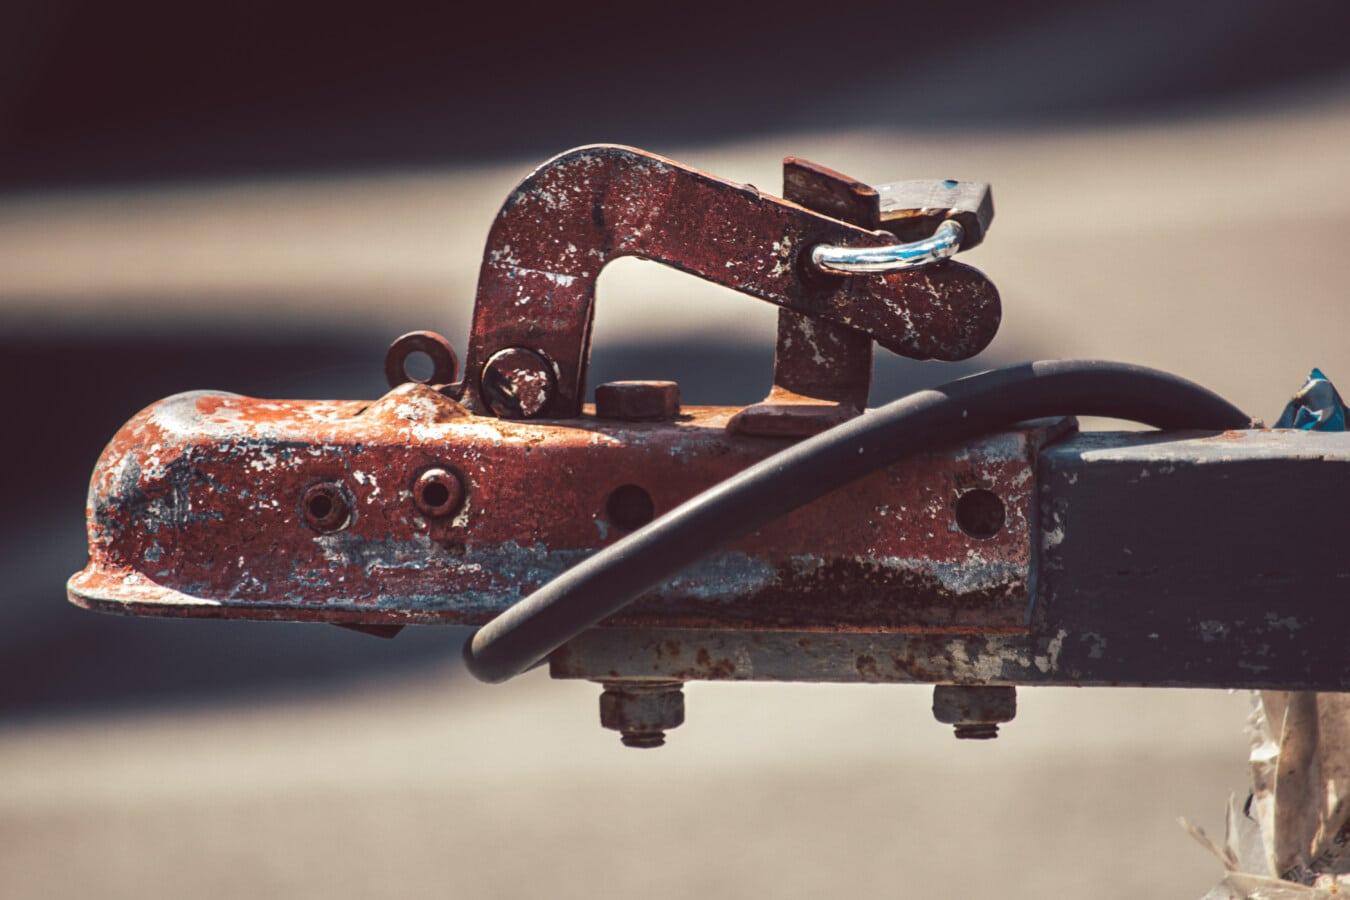 hook, trailer, cast iron, transport, device, iron, steel, rust, retro, old